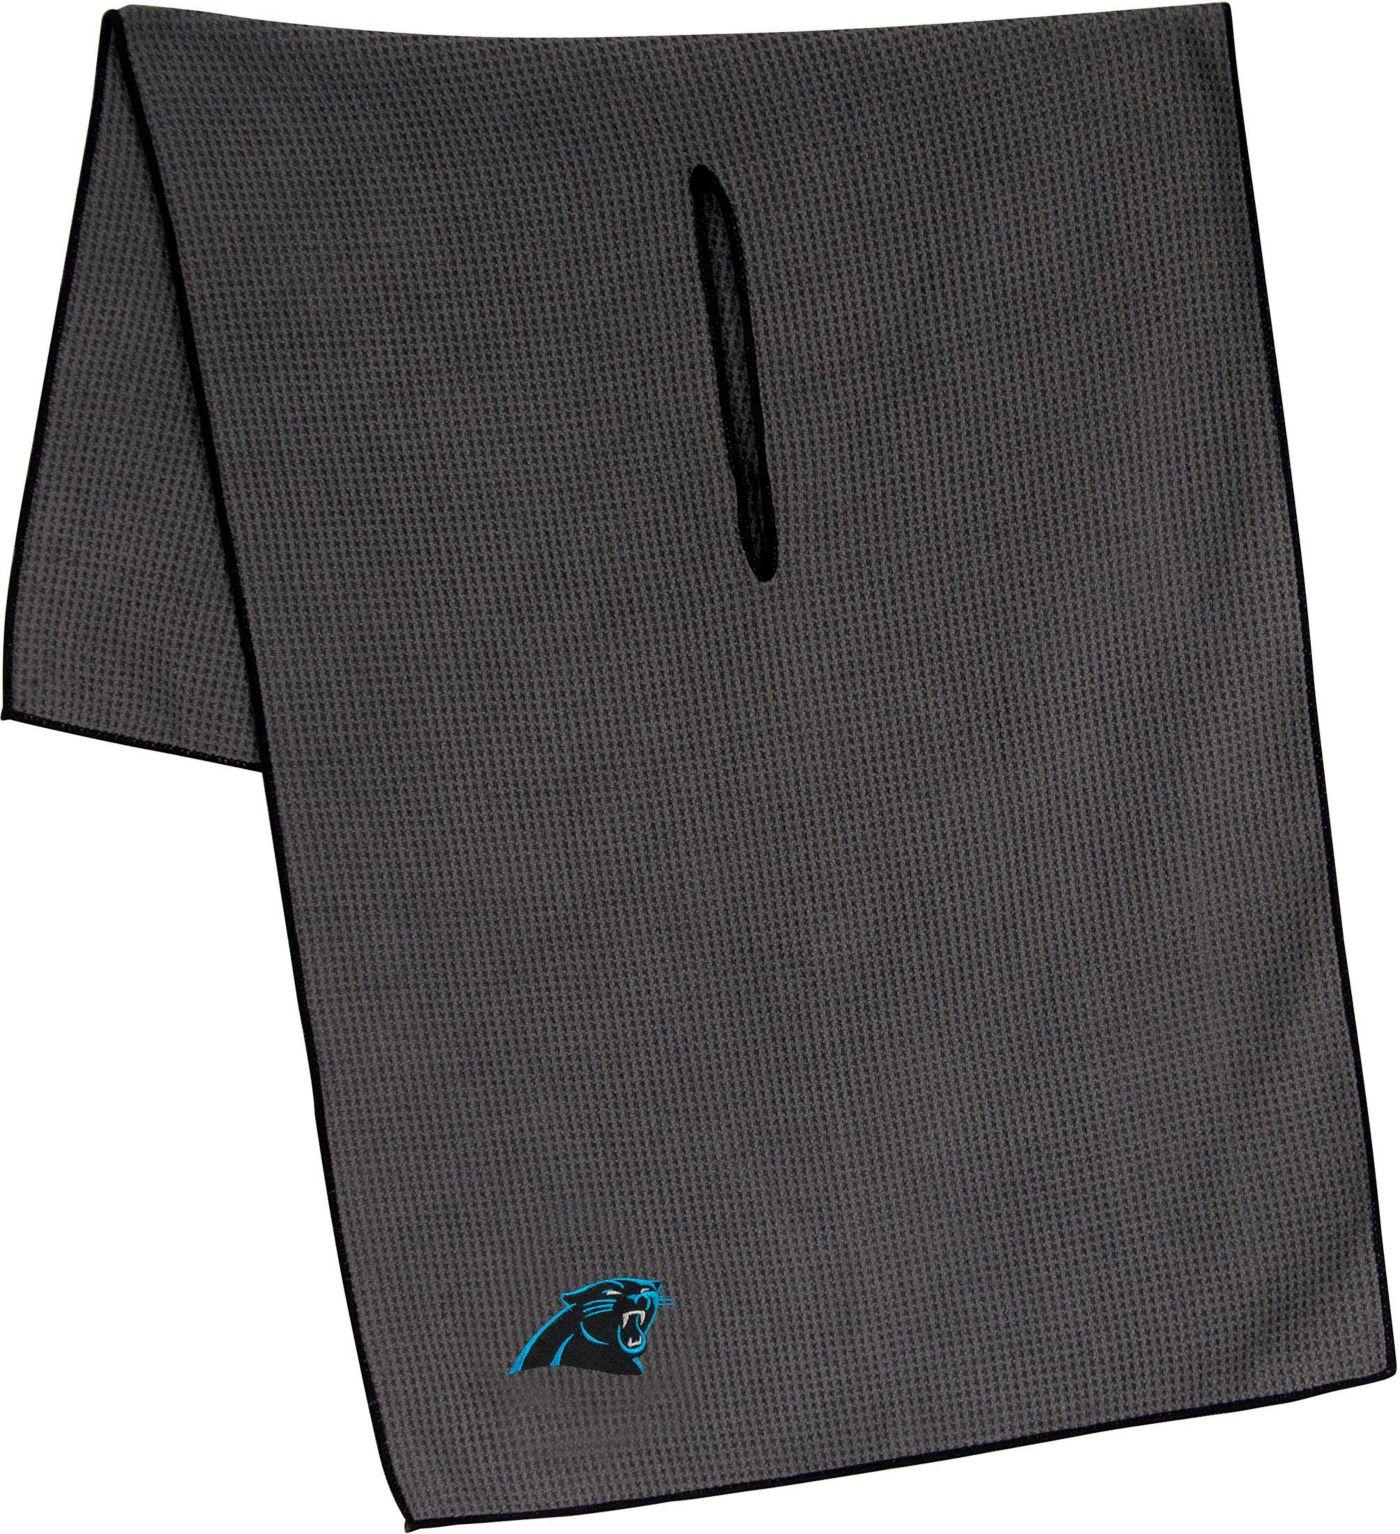 "Team Effort Carolina Panthers 19"" x 41"" Microfiber Golf Towel"